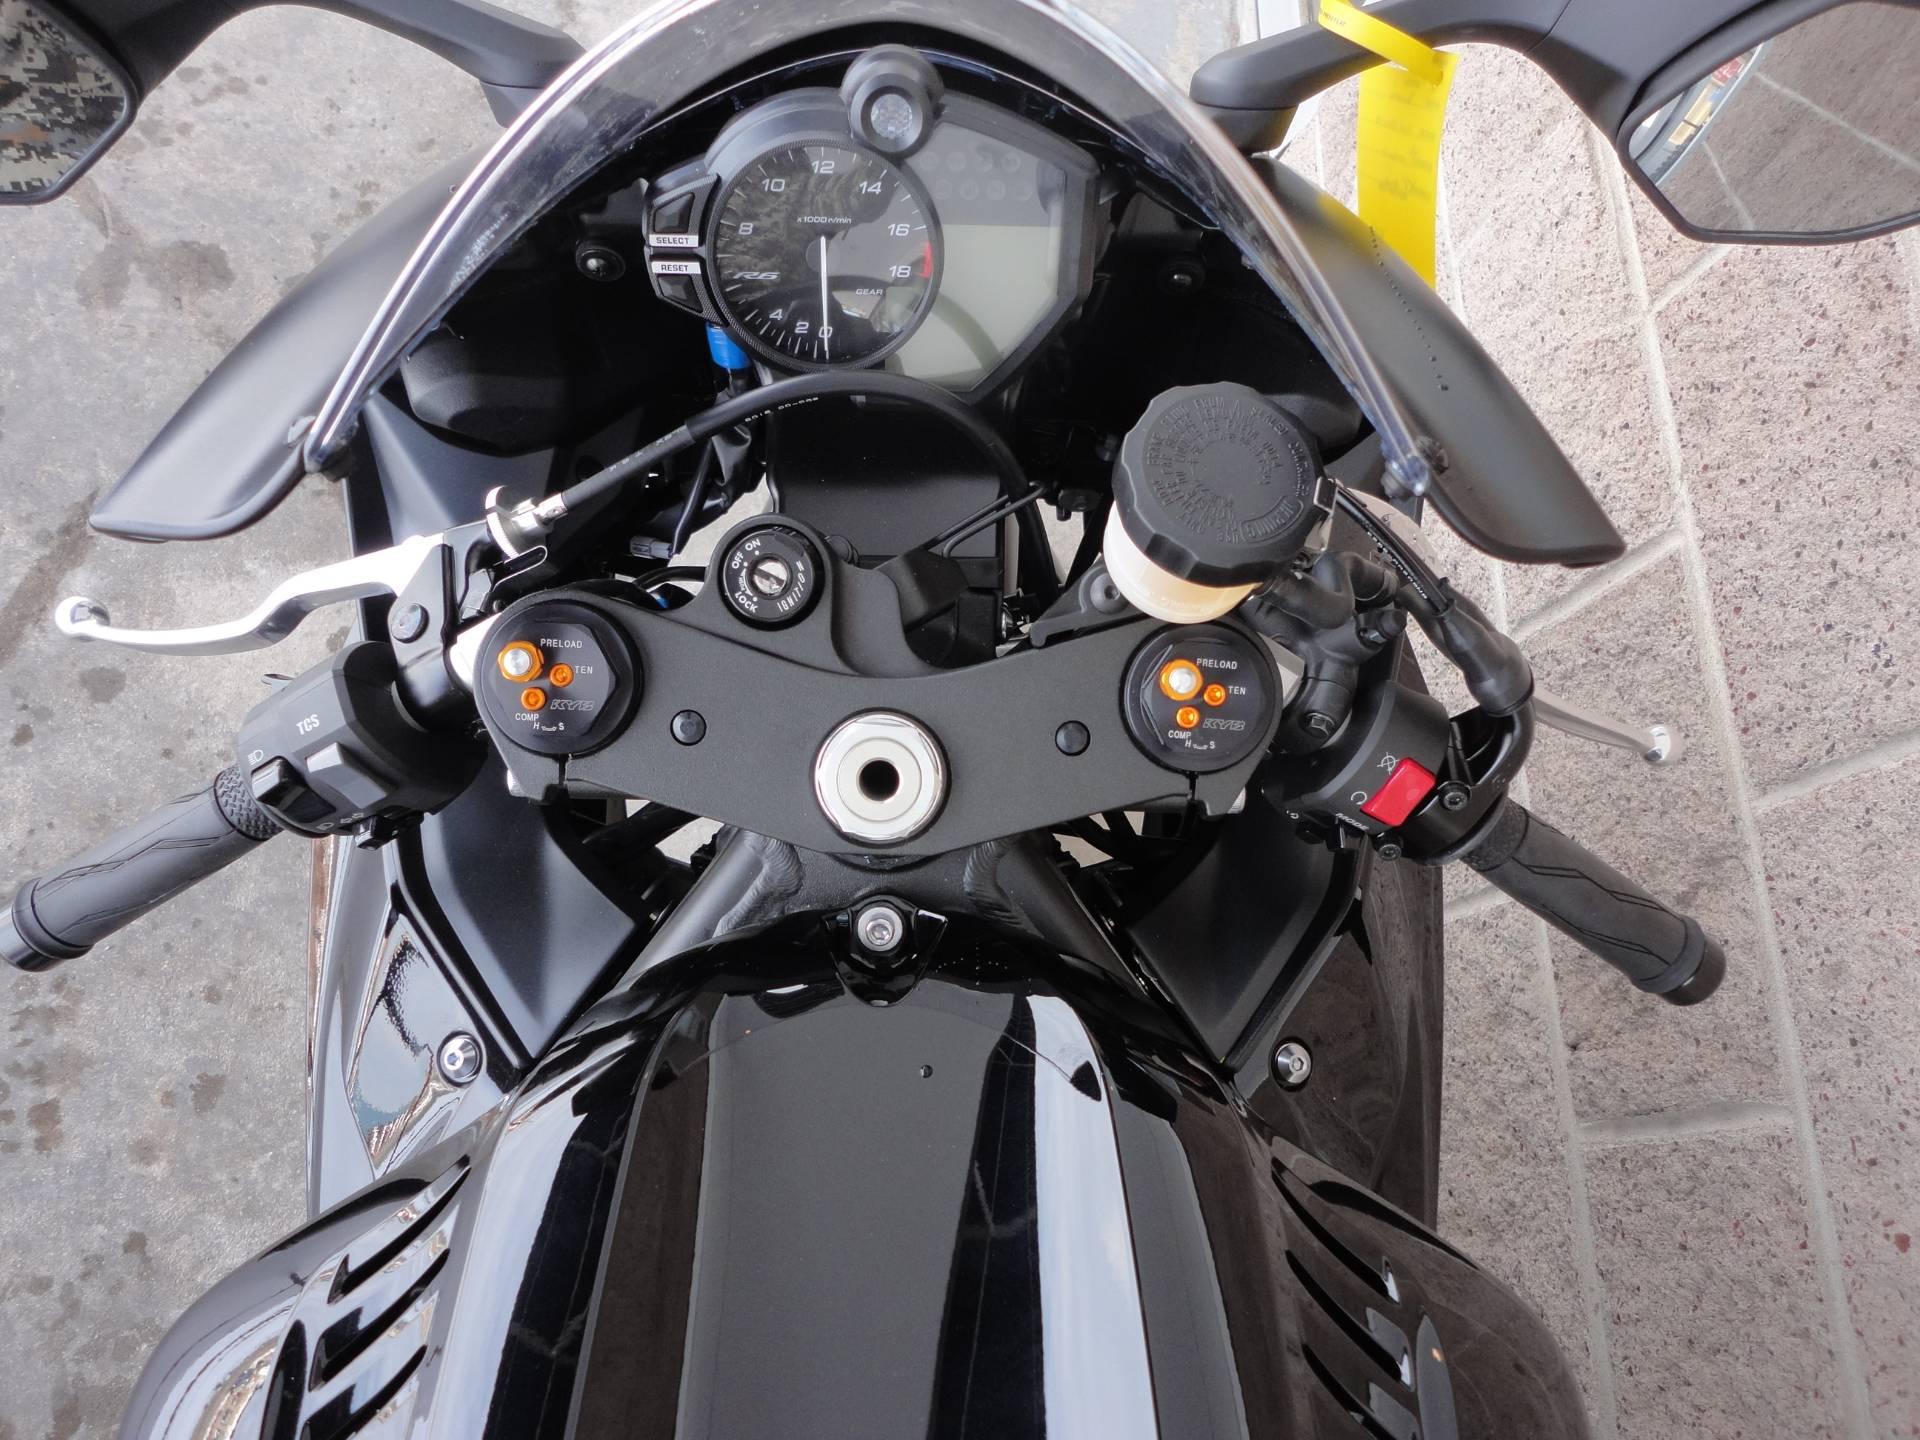 2020 Yamaha YZF-R6 9